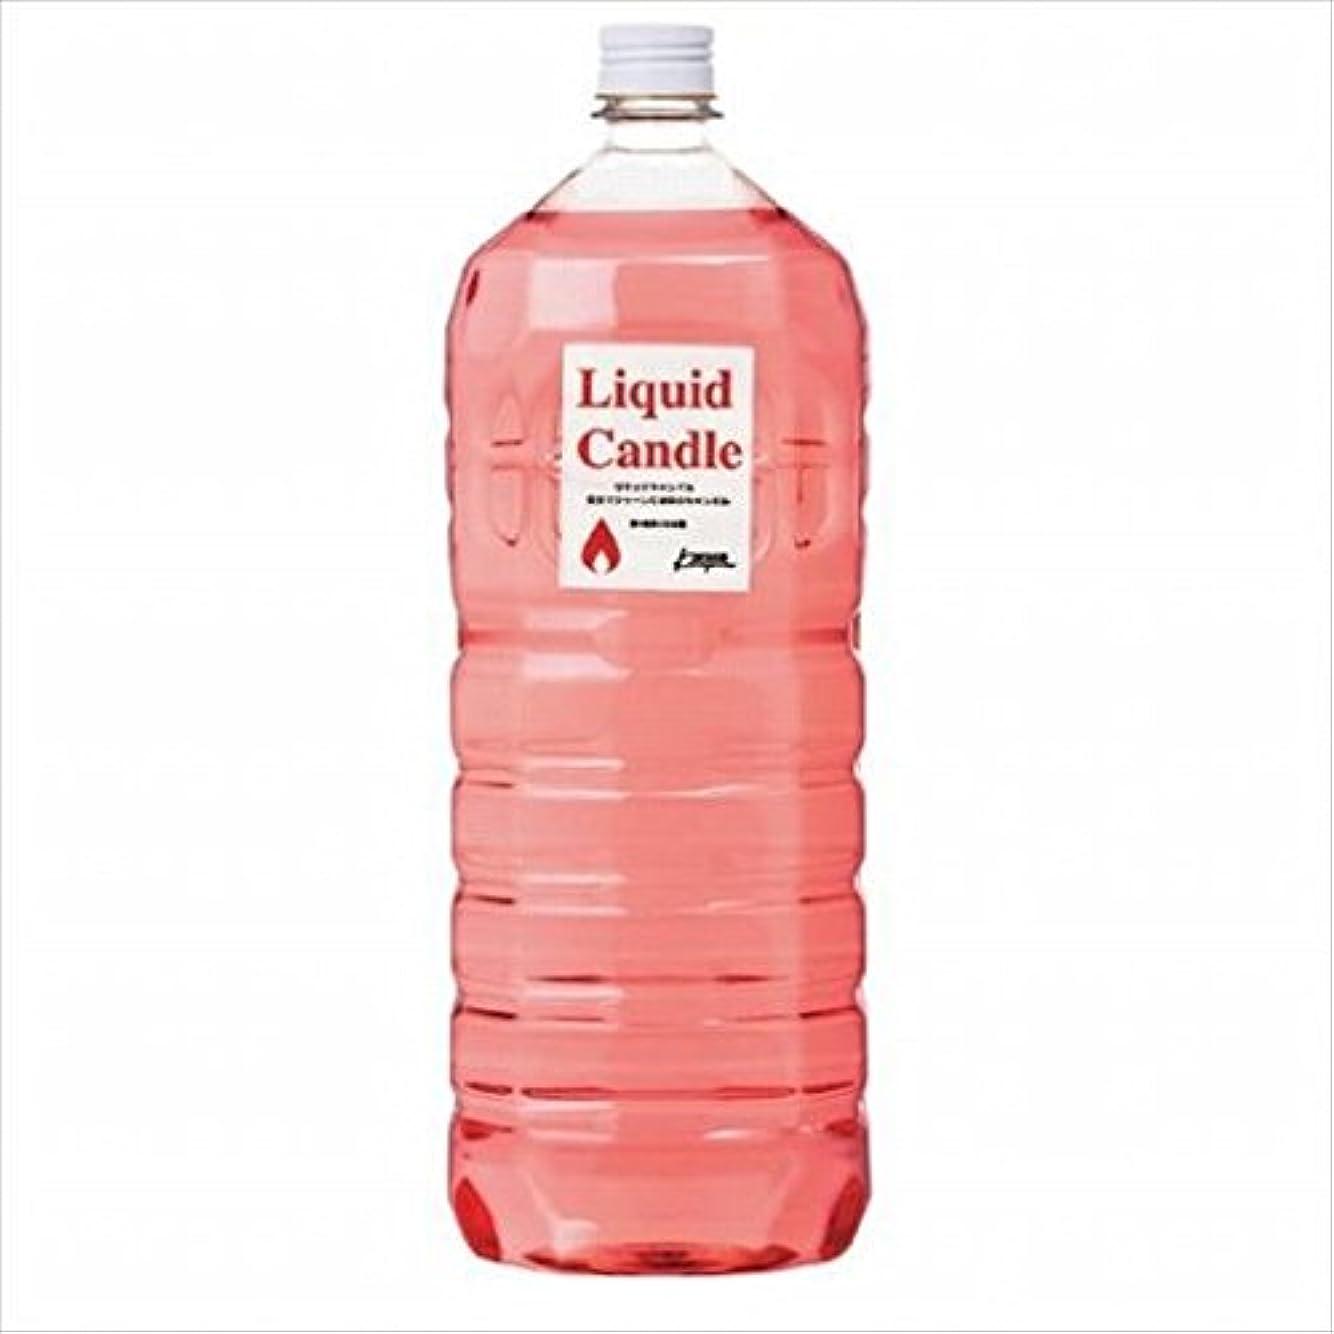 kameyama candle(カメヤマキャンドル) リキッドキャンドル2リットル 「 ピンク 」(77310000P)